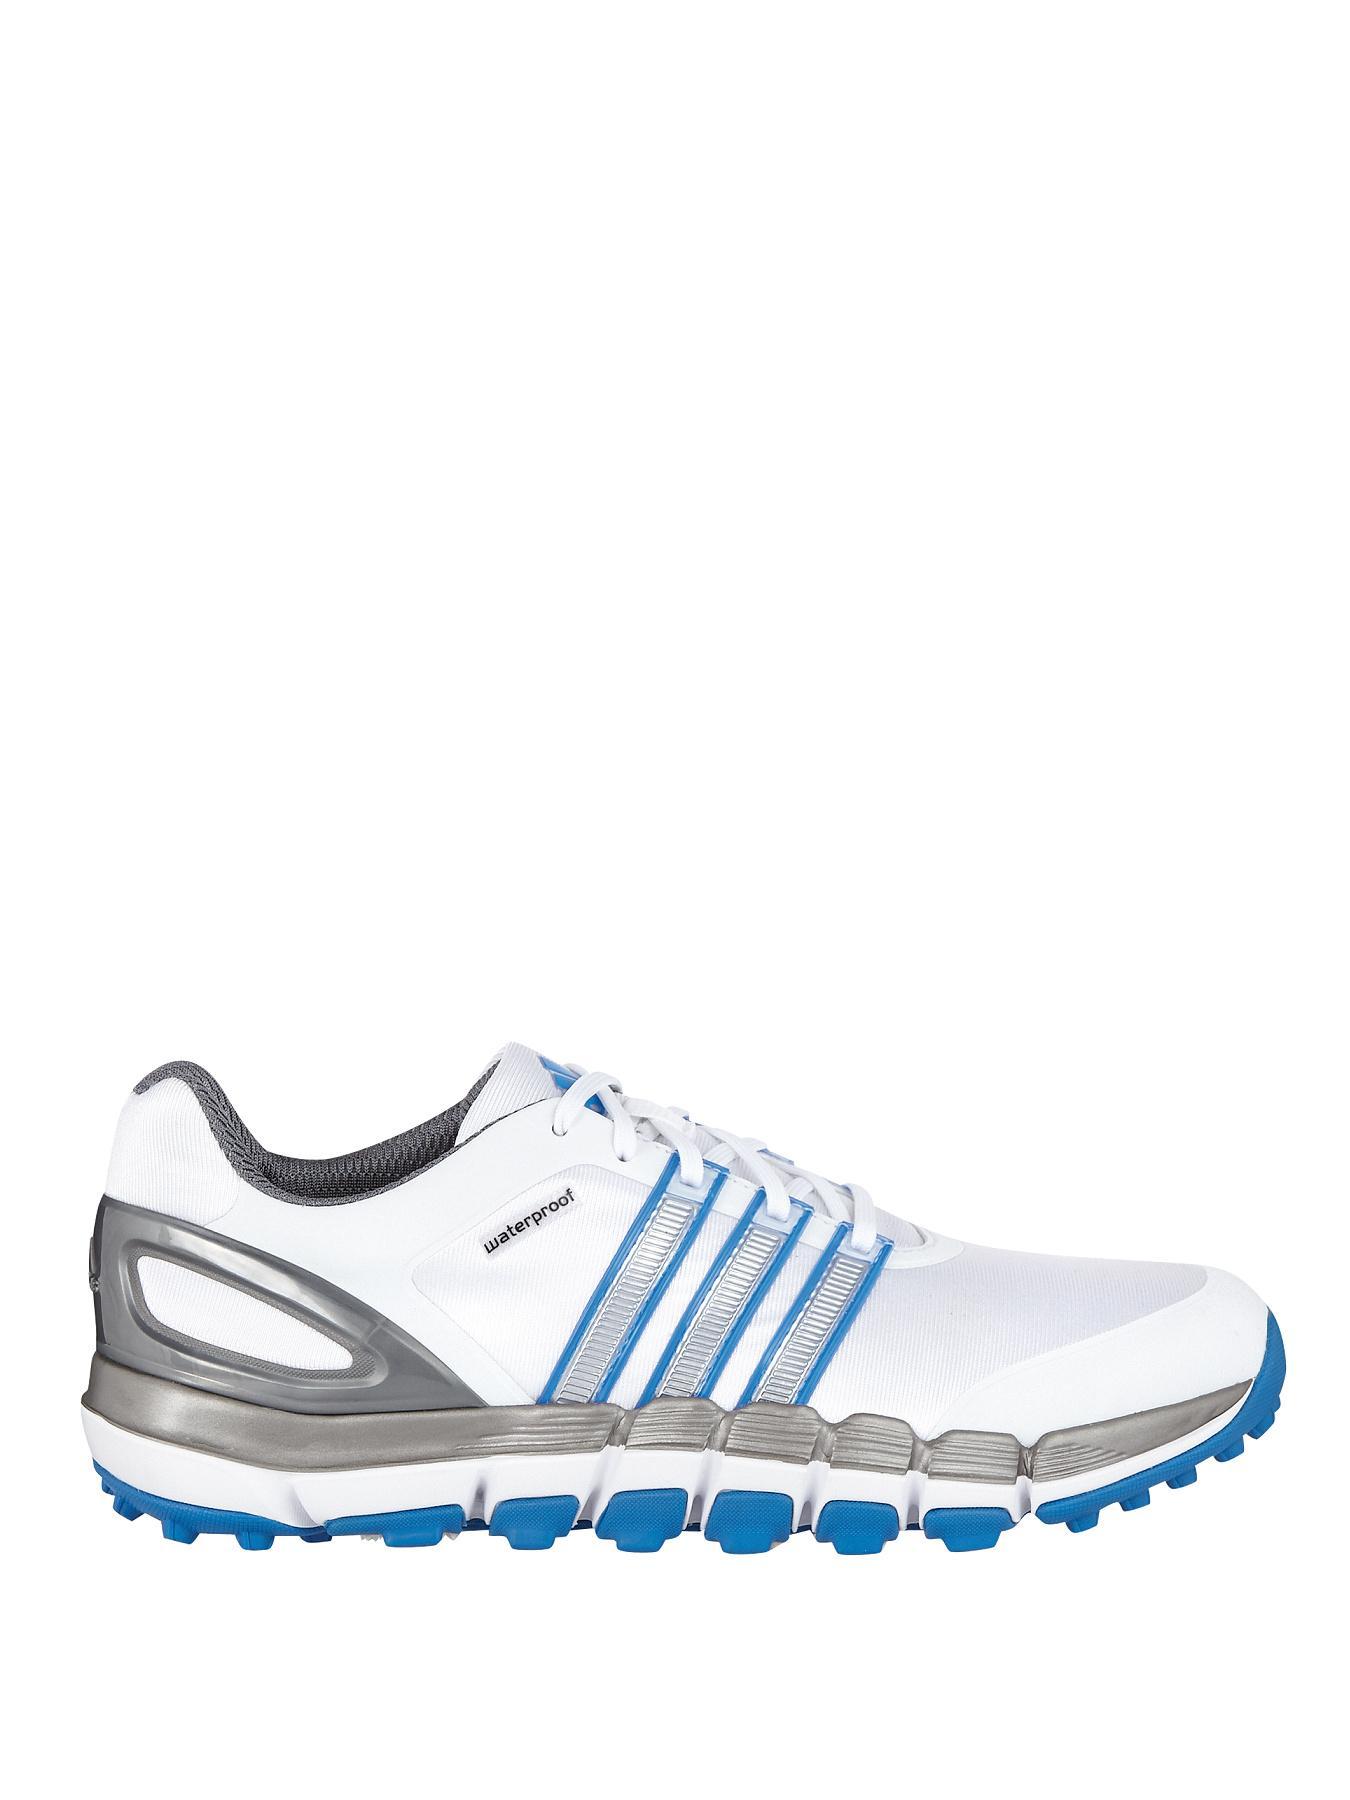 adidas Pure 360 Gripmore Sport Trainers - White/Silver/Bahia Blue